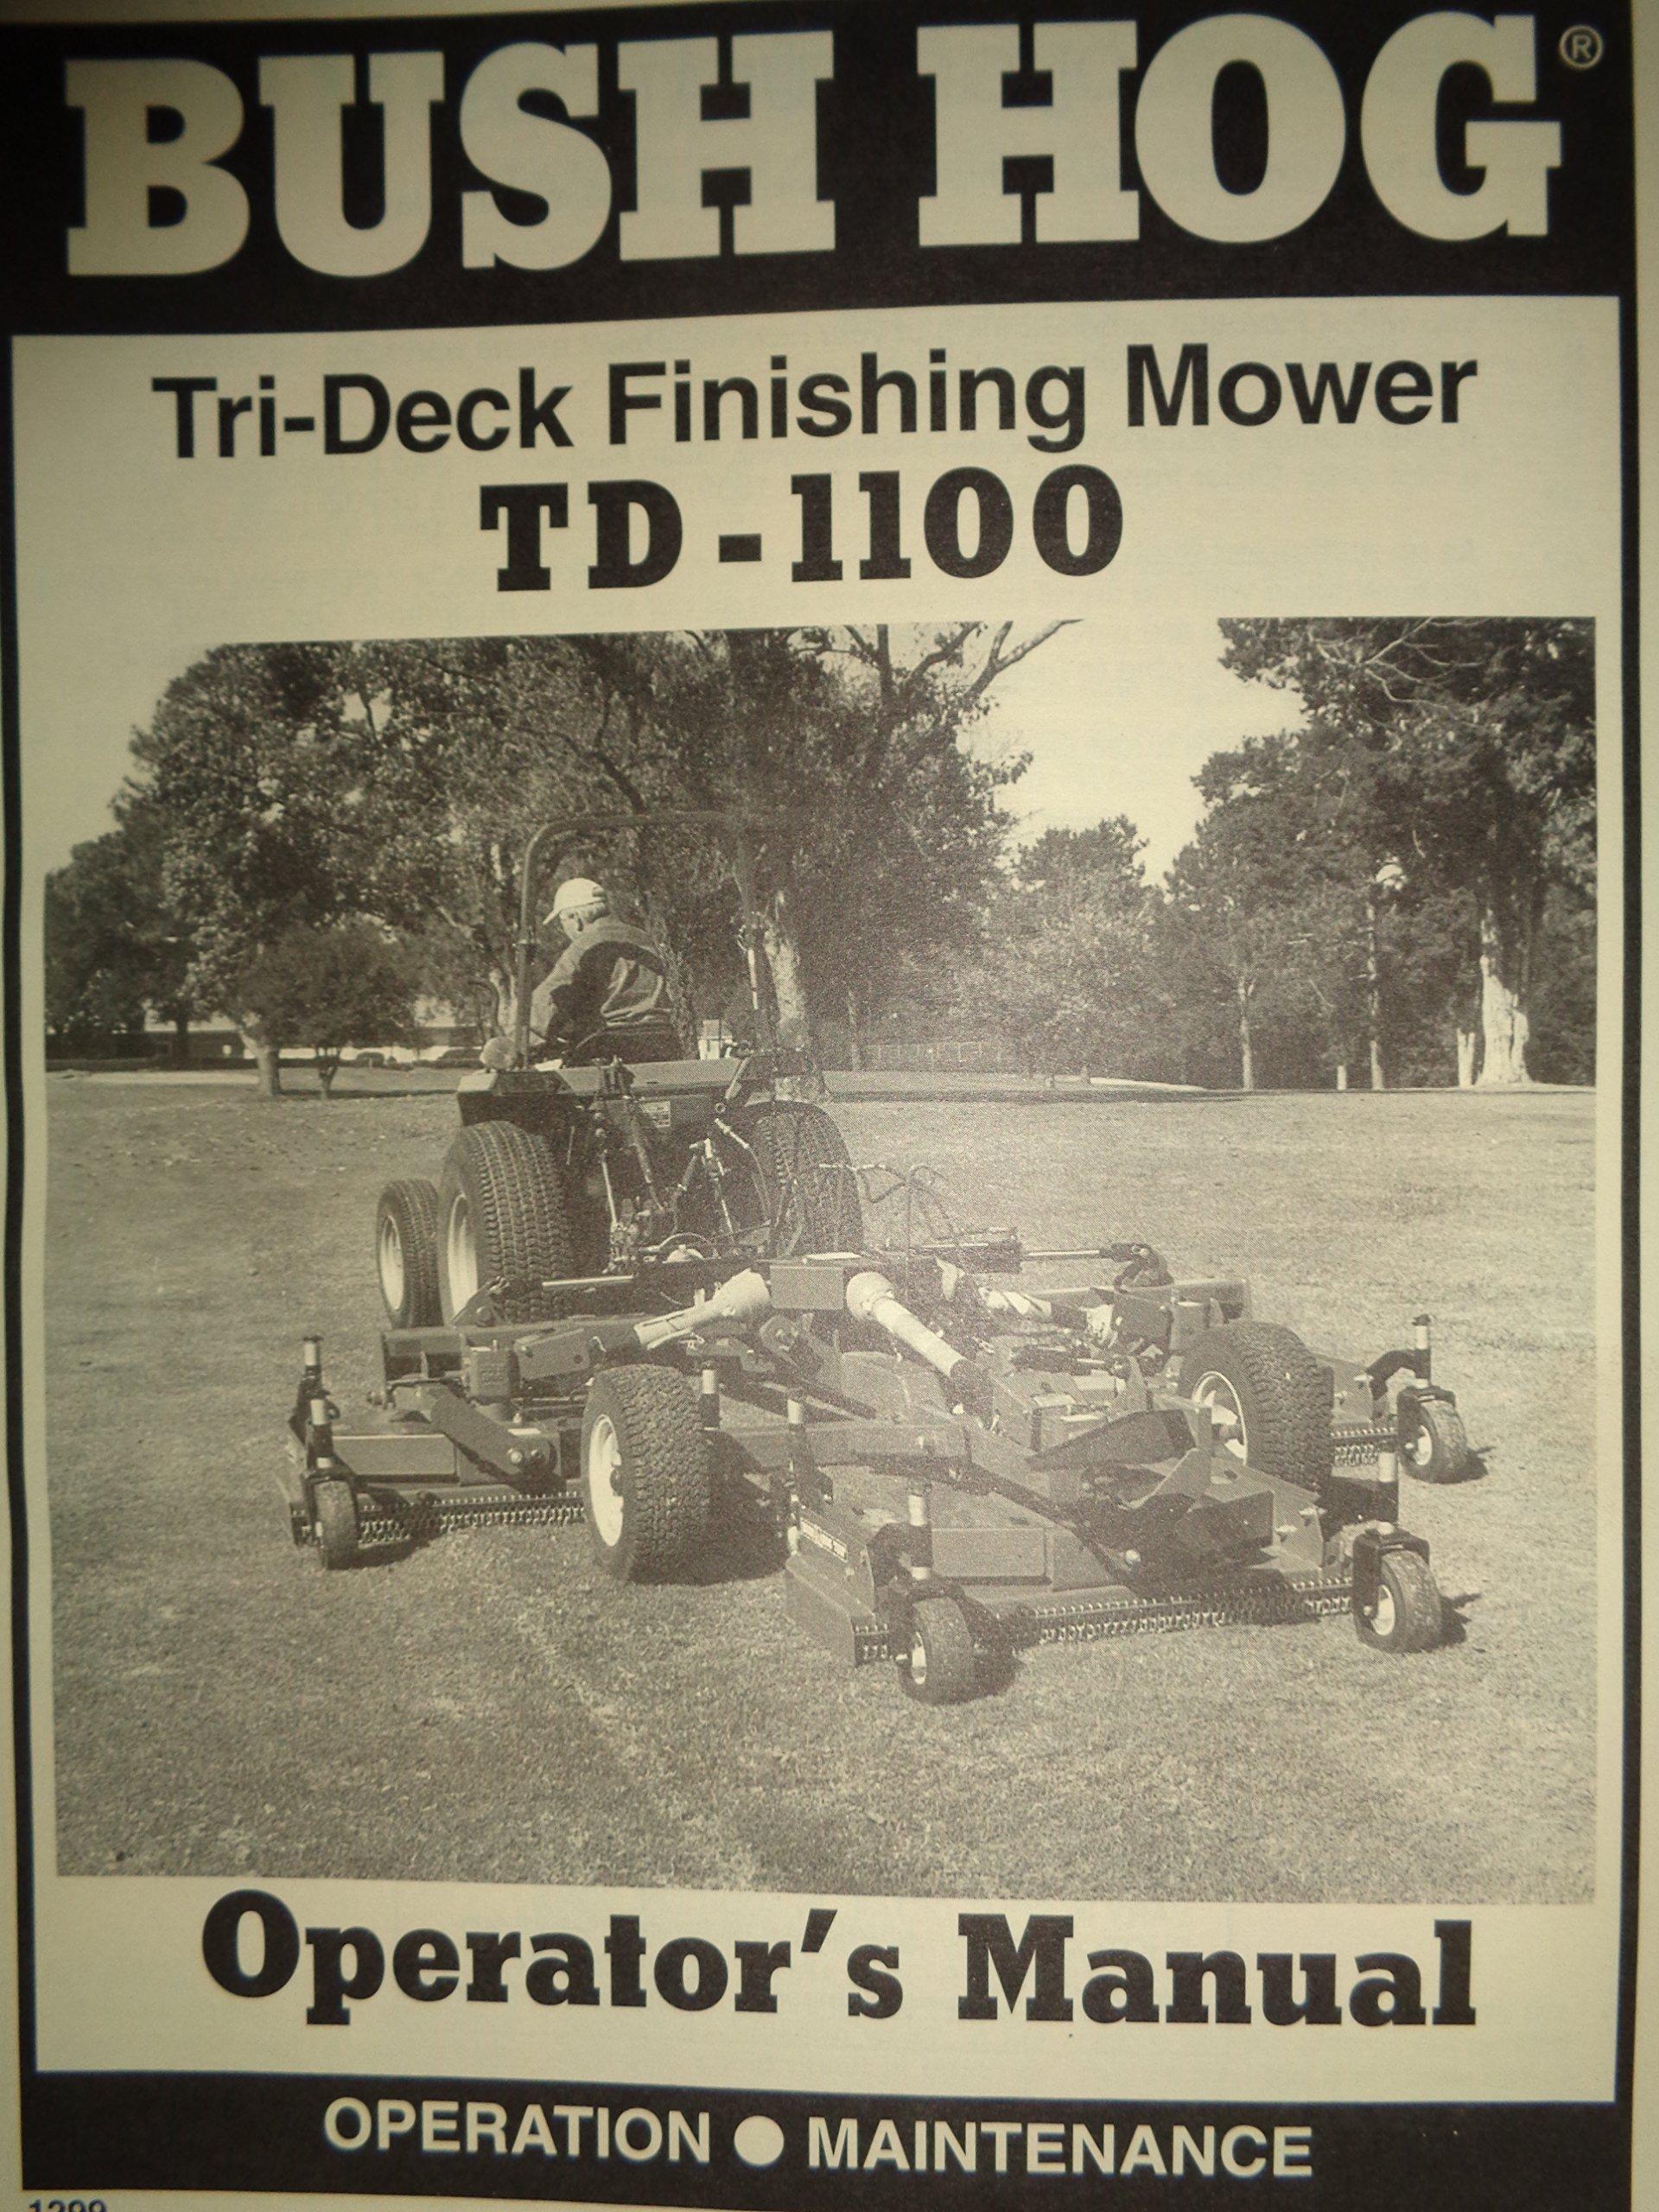 Bush Hog TD-1100 Tri-Deck Finishing Rotary Cutter Mower Operators